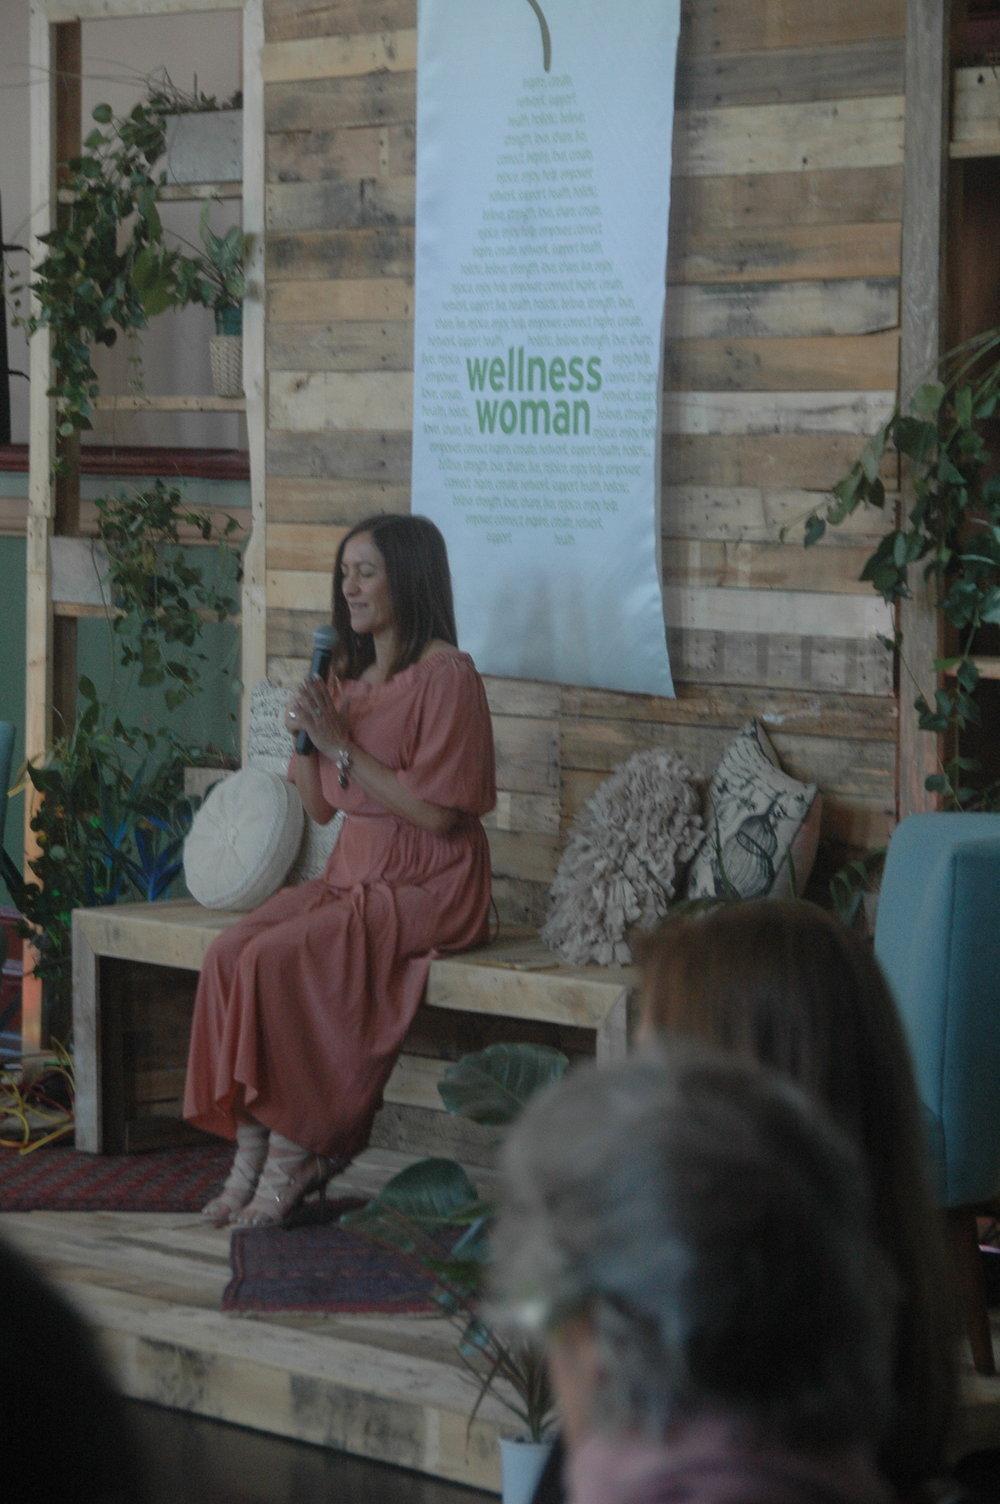 Romina Di Federico Wellness Woman 2017